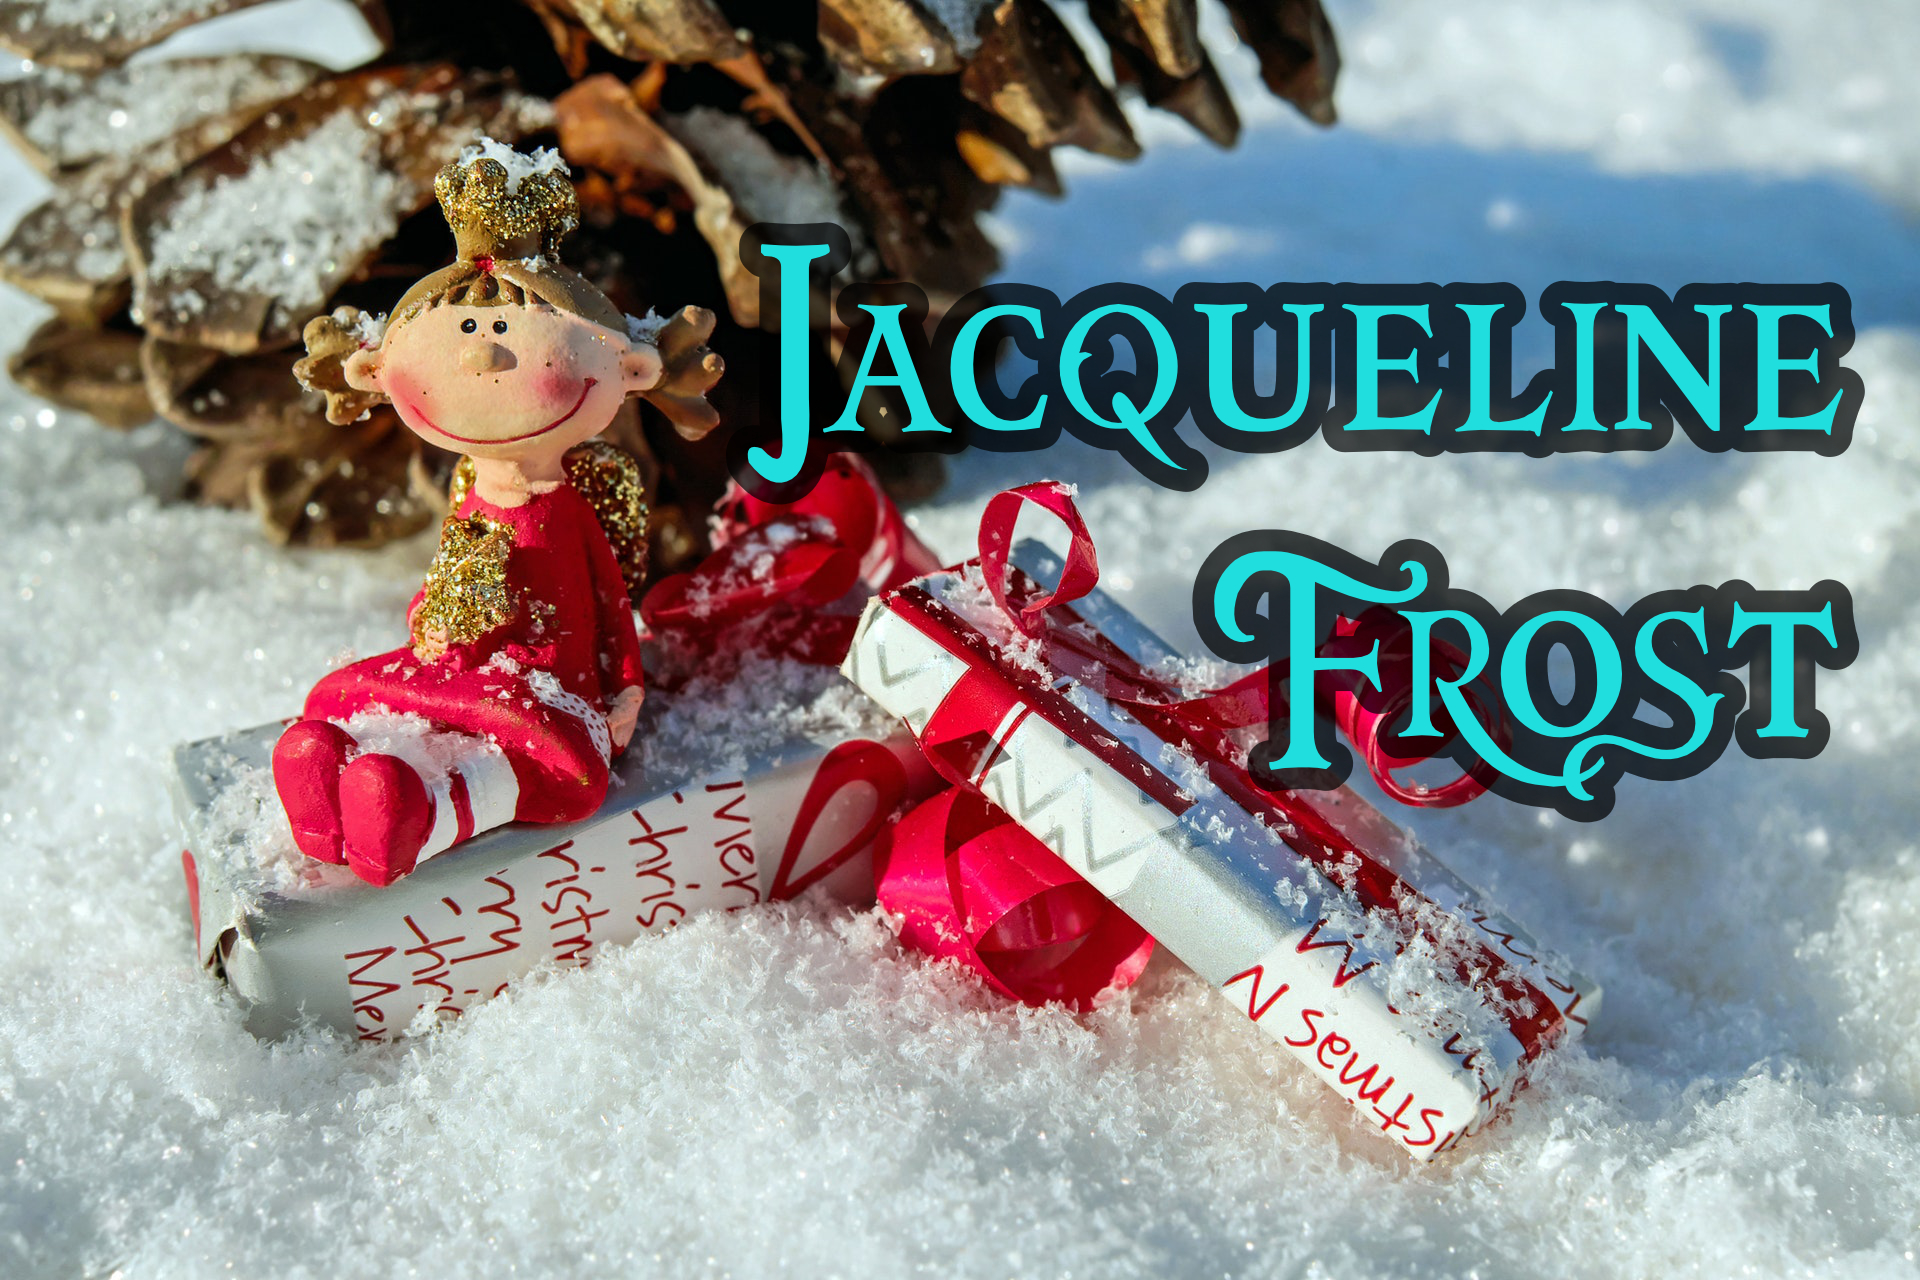 Jacqui Frost Main Image V2.jpg